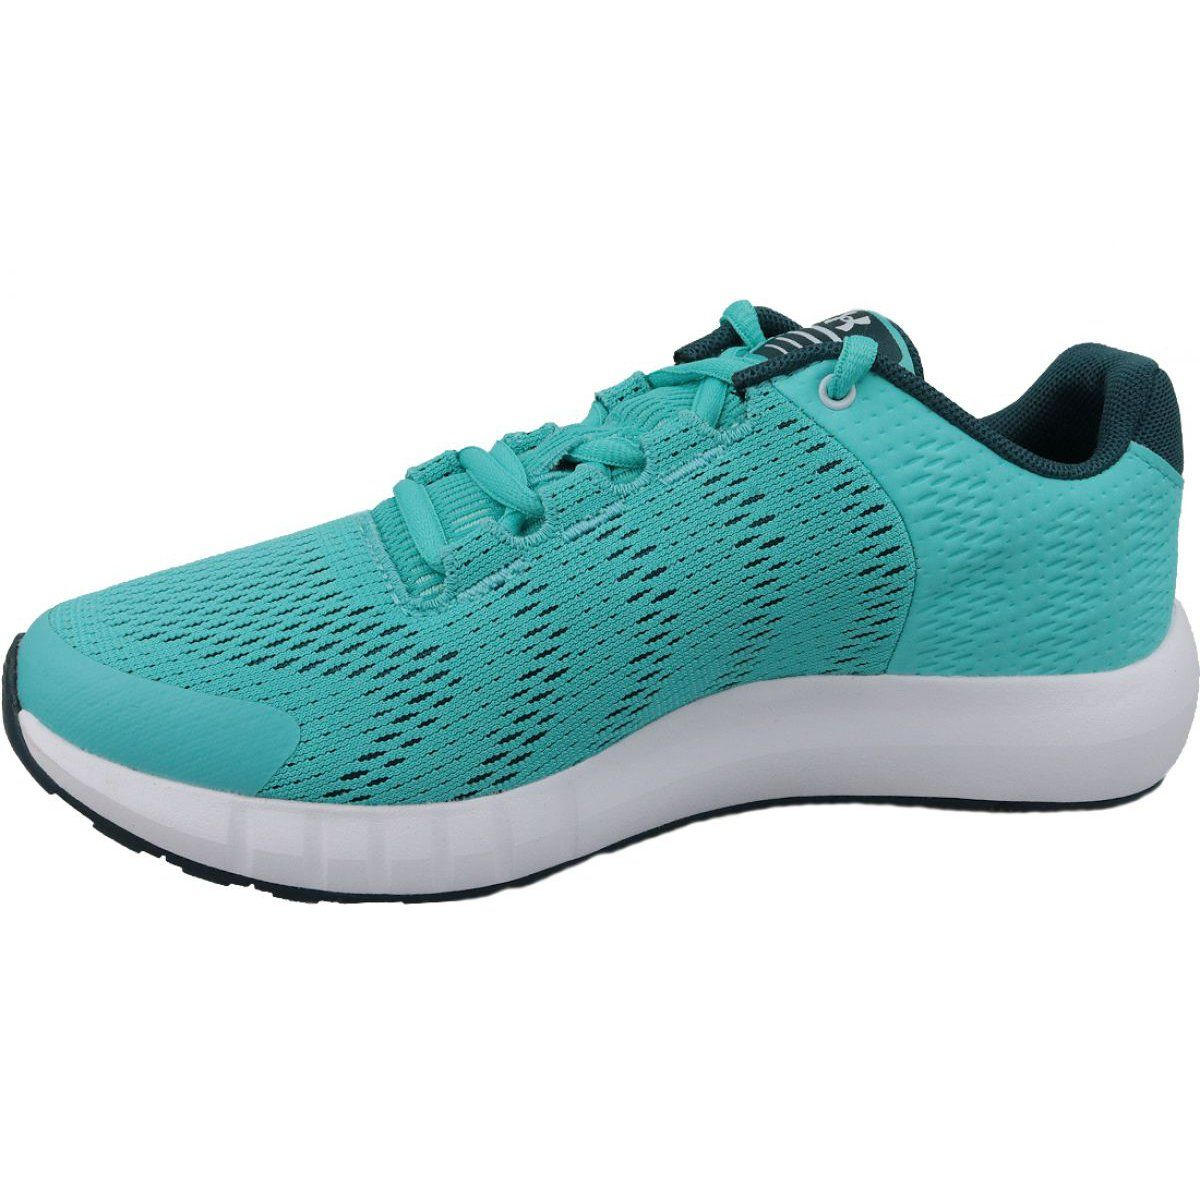 Under Armour Under Armor Pursuit Bp Jr 3022092 300 Running Shoes Blue Blue Shoes Running Shoes Under Armour